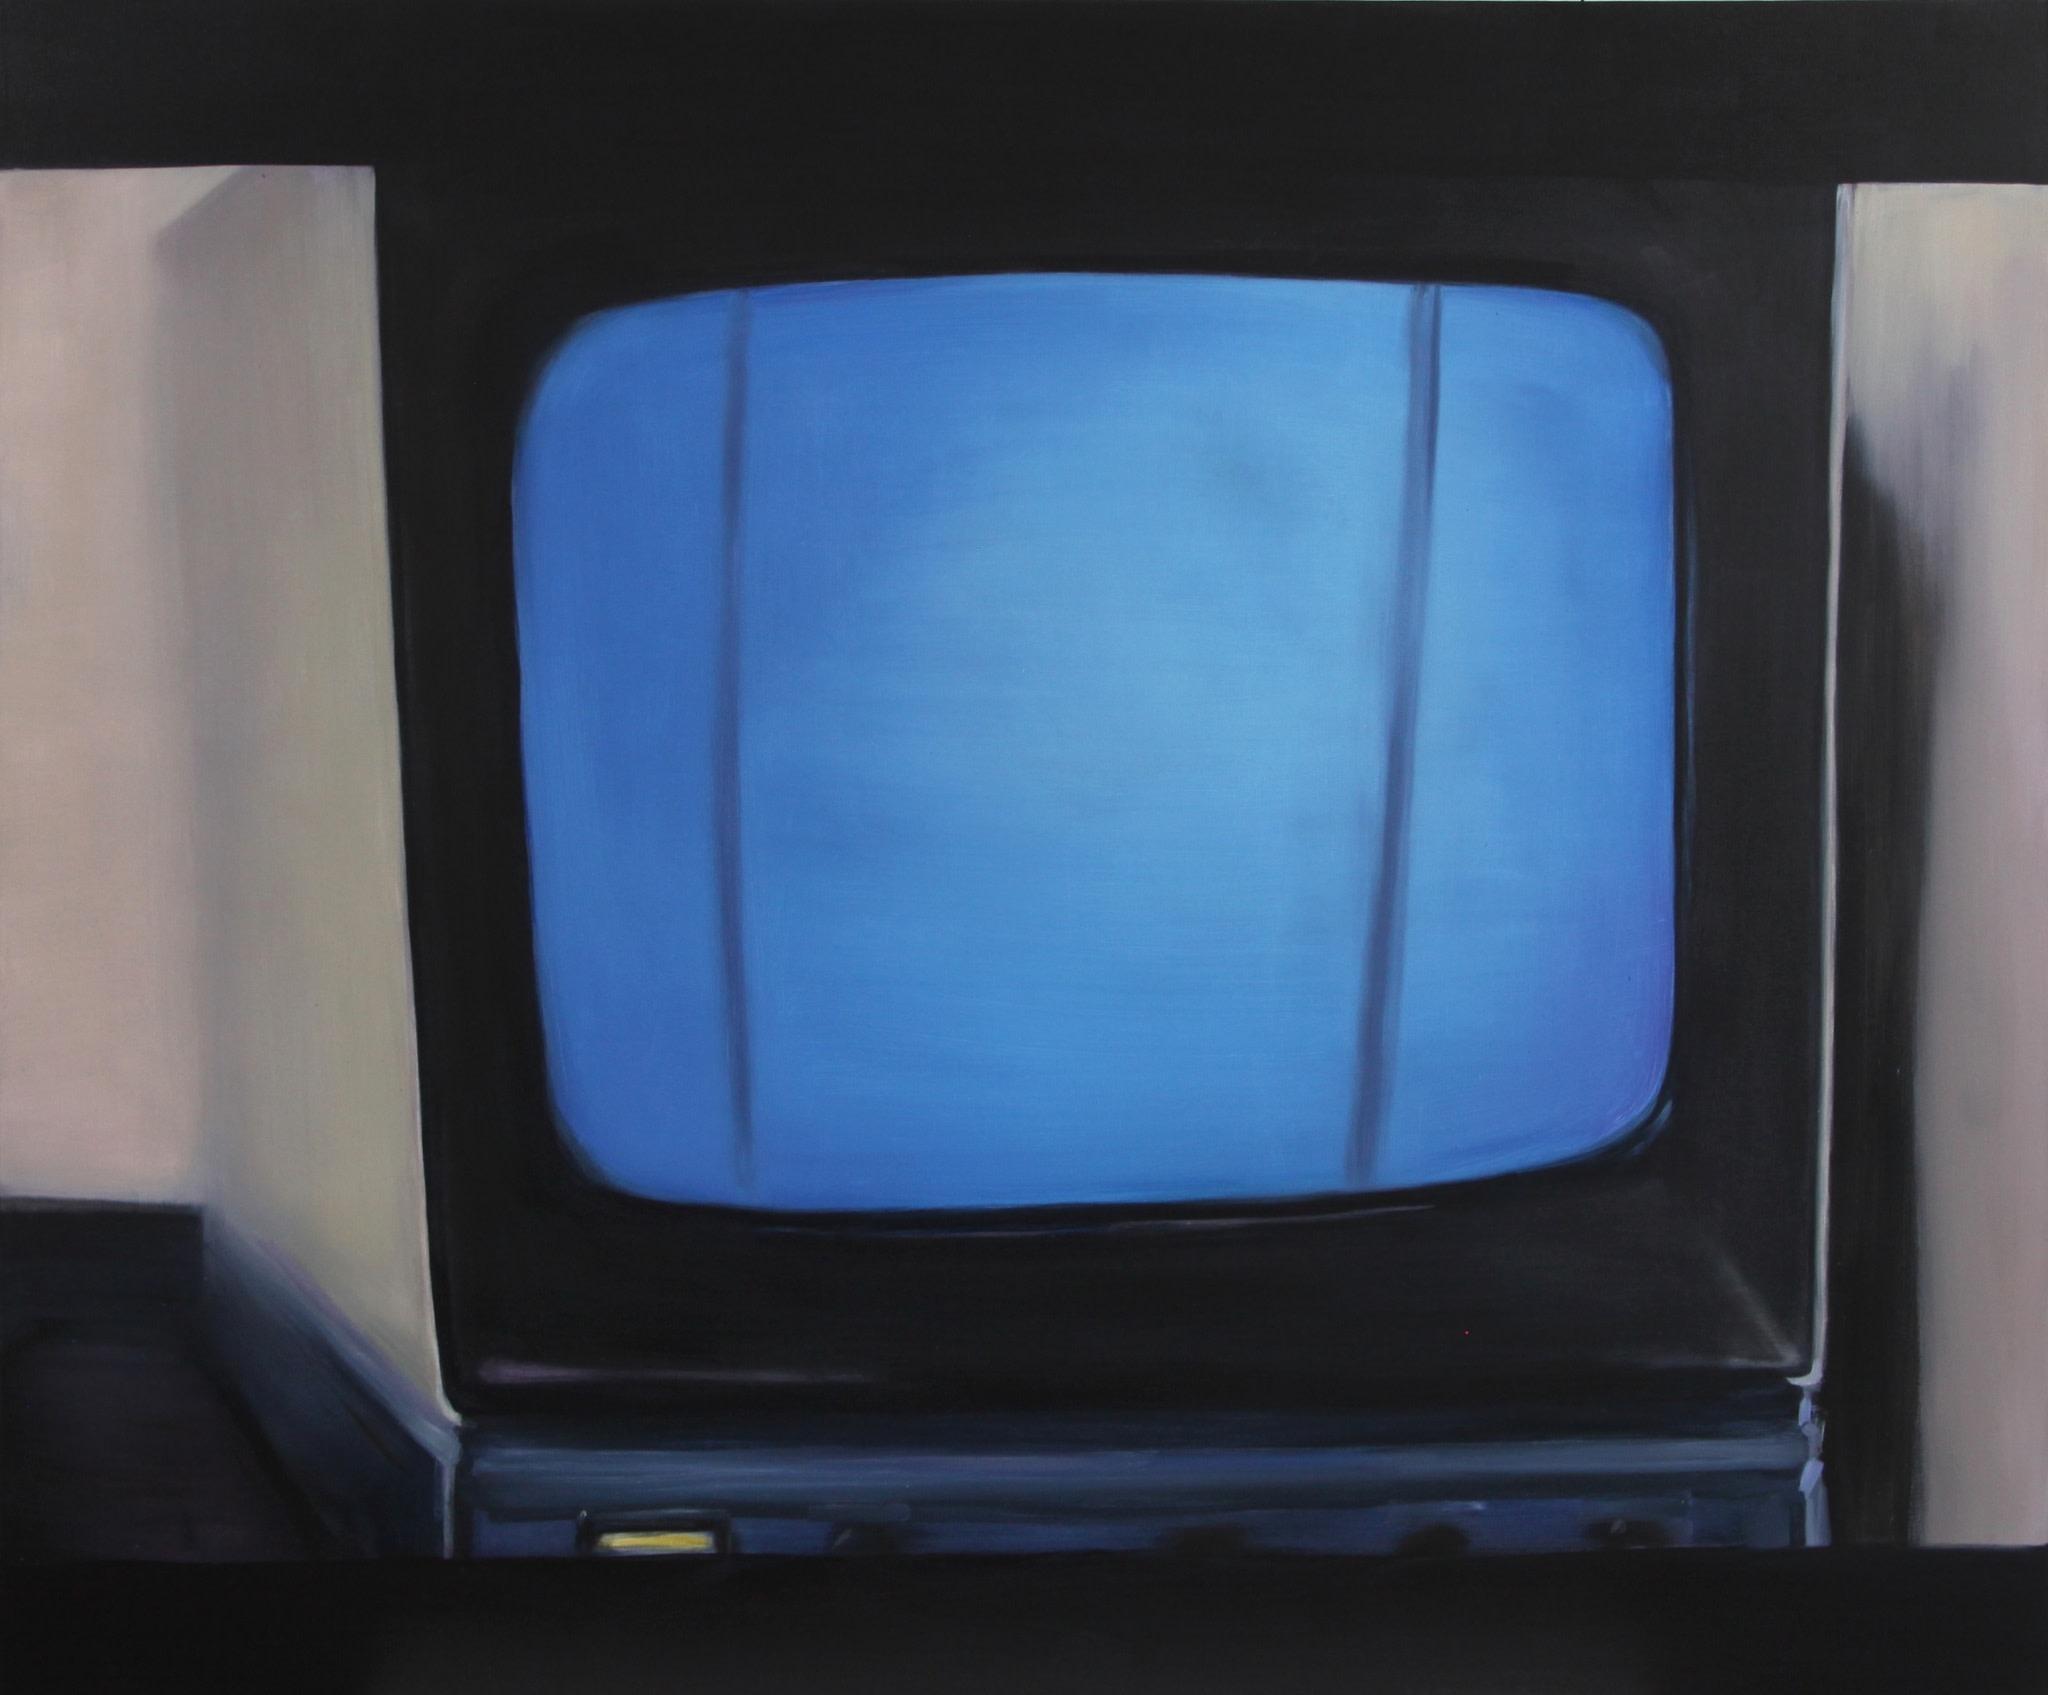 <span class=&#34;link fancybox-details-link&#34;><a href=&#34;/artists/14-rachel-lancaster/works/8784/&#34;>View Detail Page</a></span><div class=&#34;artist&#34;><strong>Rachel Lancaster</strong></div> <div class=&#34;title&#34;>untitled, 2015</div> <div class=&#34;medium&#34;>Oil on canvas</div> <div class=&#34;dimensions&#34;>154 x 183 cm<br />60 5/8 x 72 1/8 in</div><div class=&#34;copyright_line&#34;>Copyright The Artist</div>